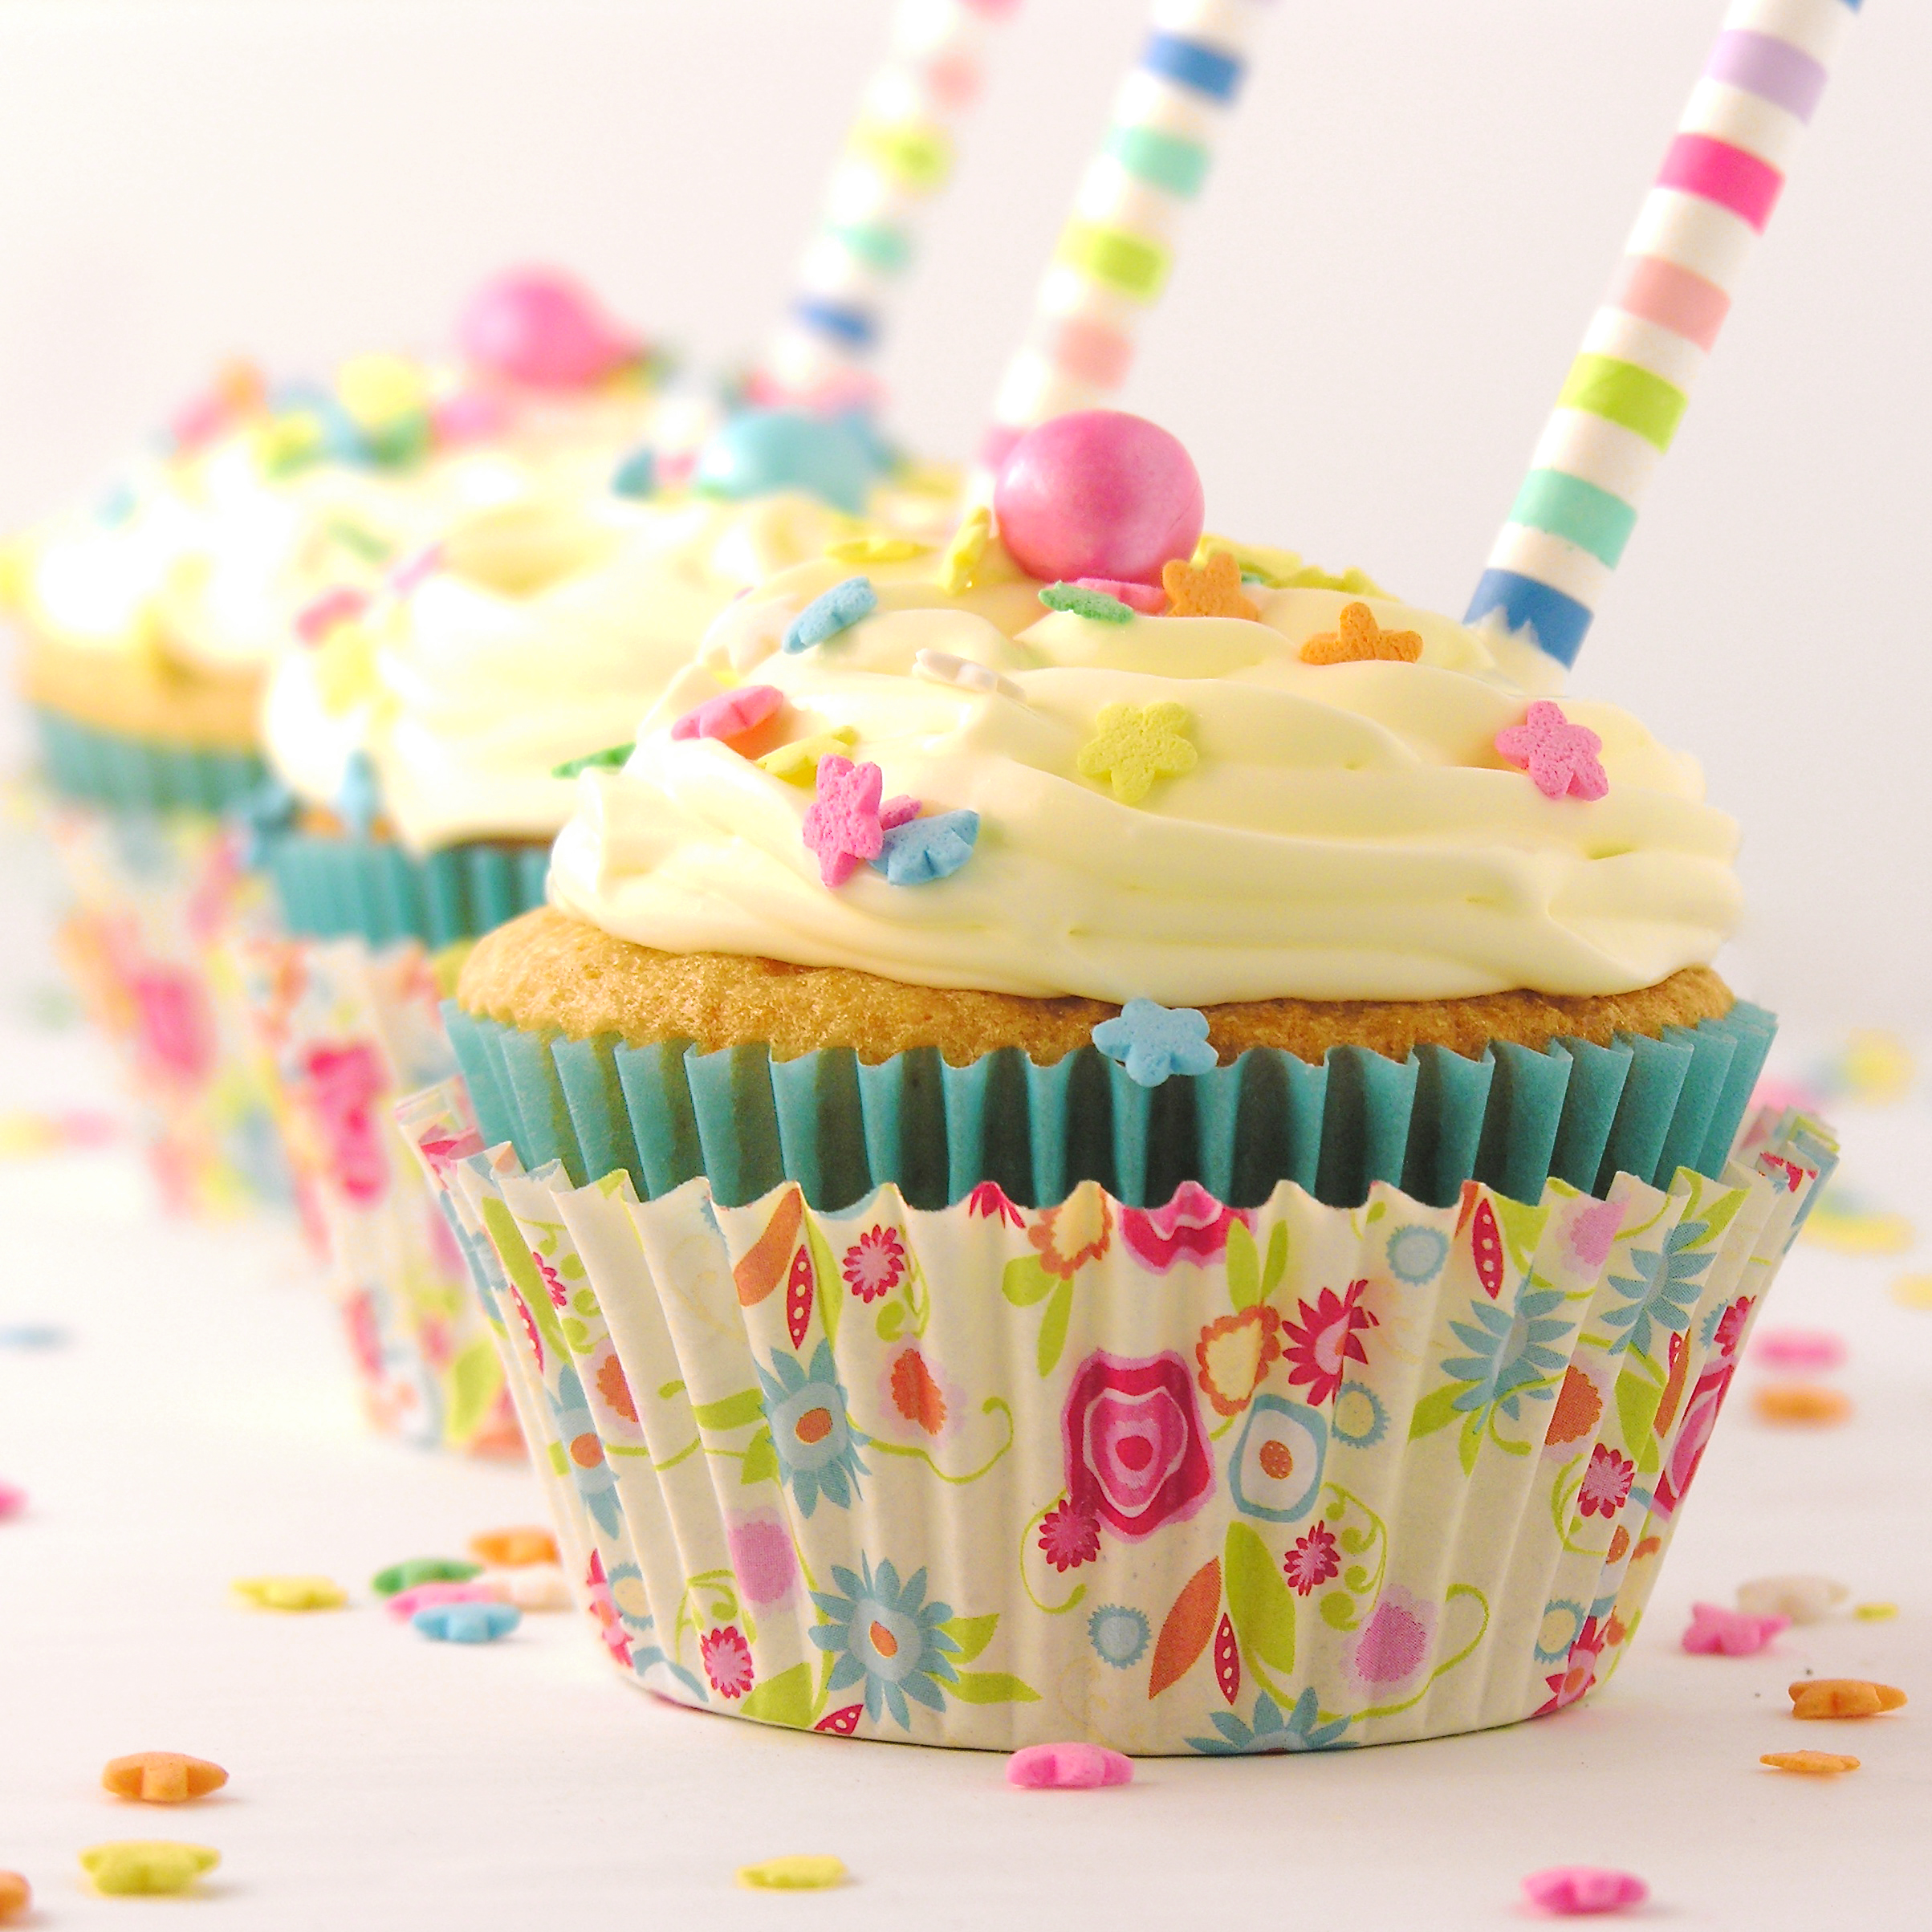 cupcakes   eASYbAKED